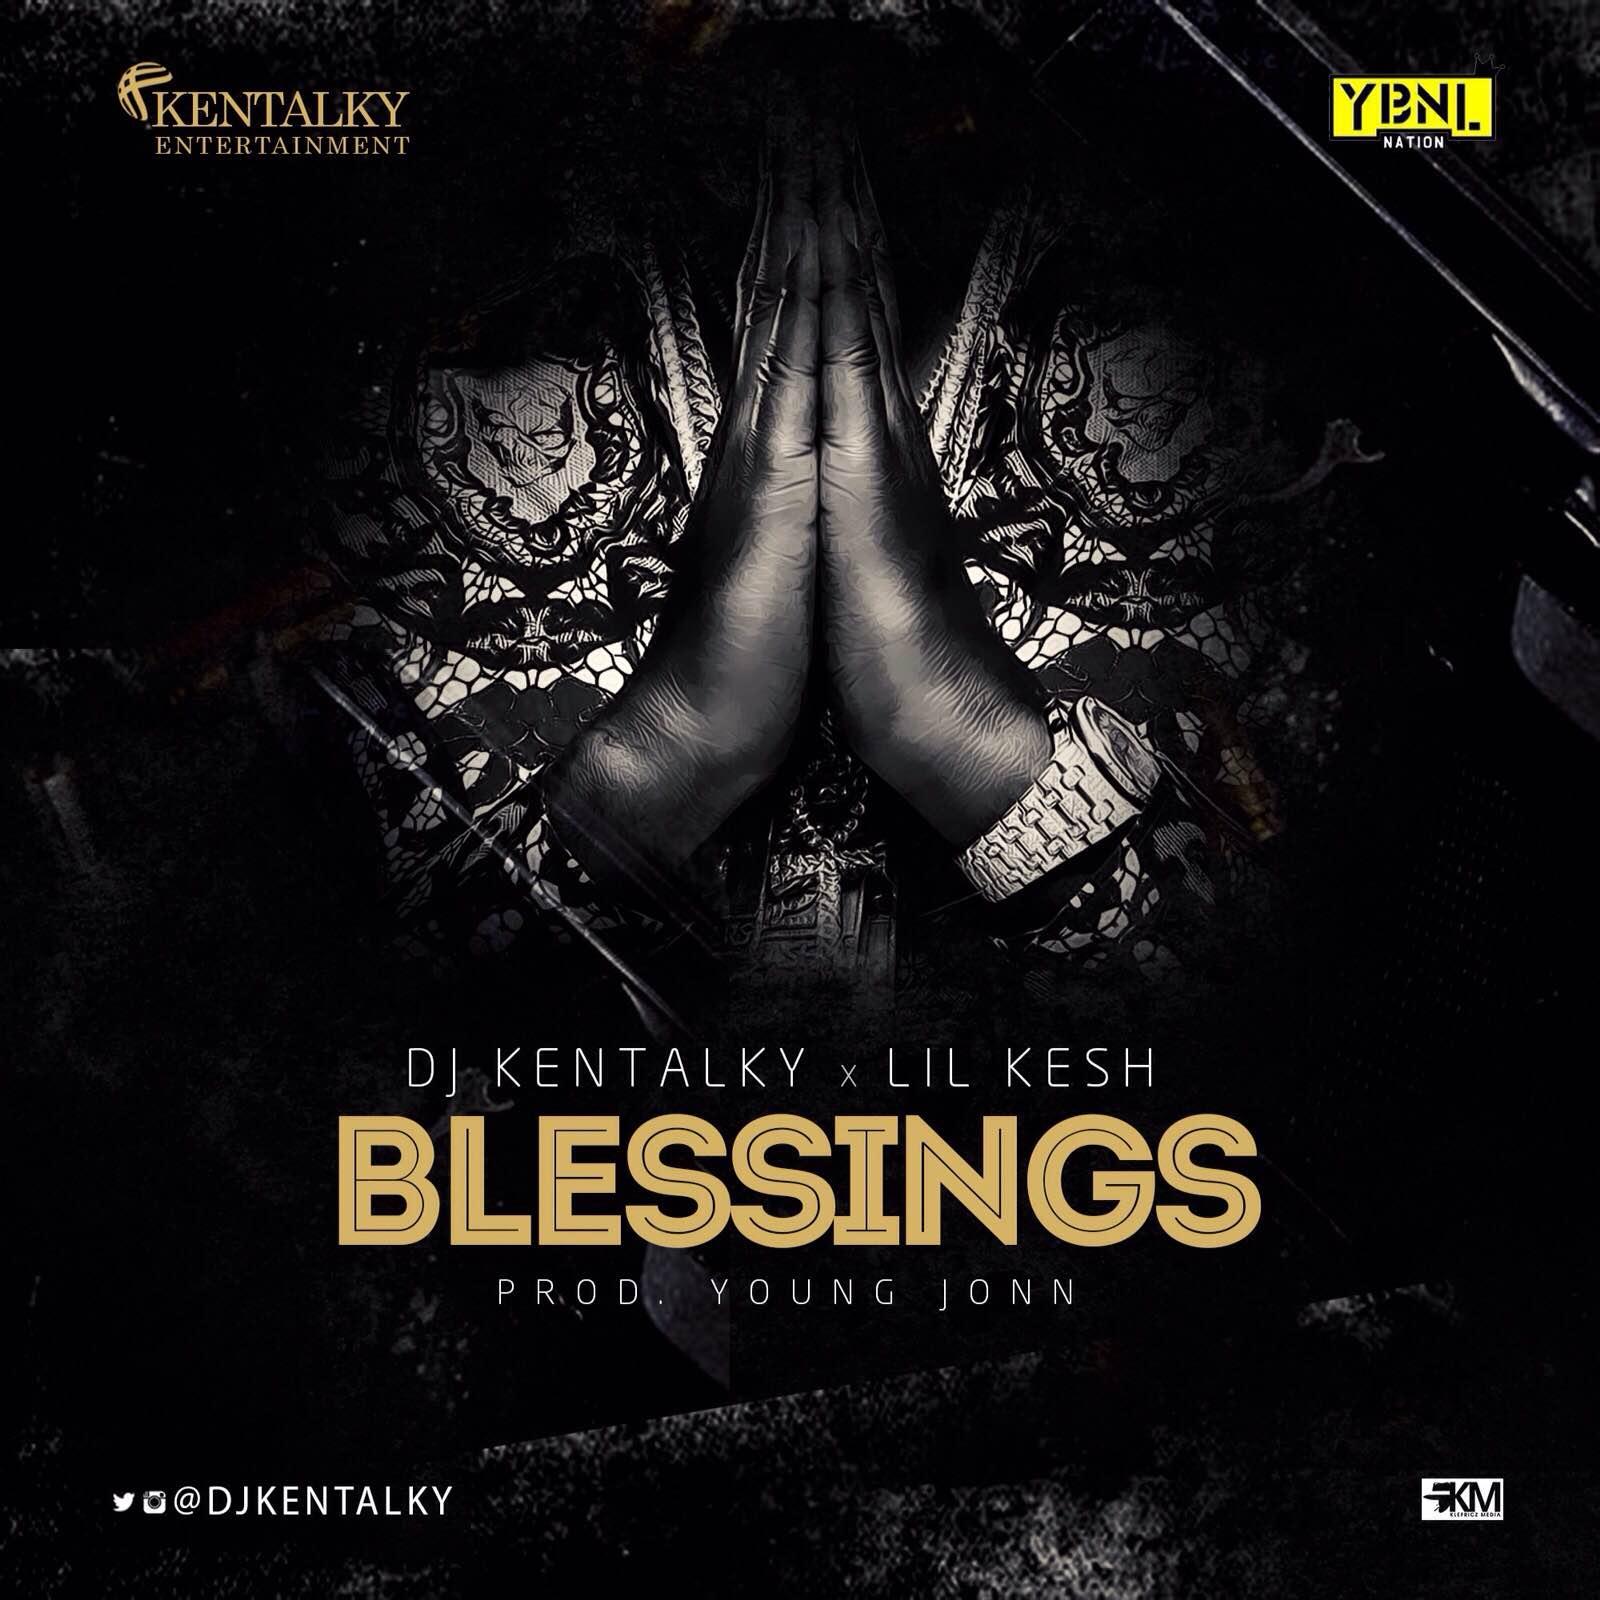 DJ Kentalky ft. Lil Kesh - Blessings (prod. Young Jonn)